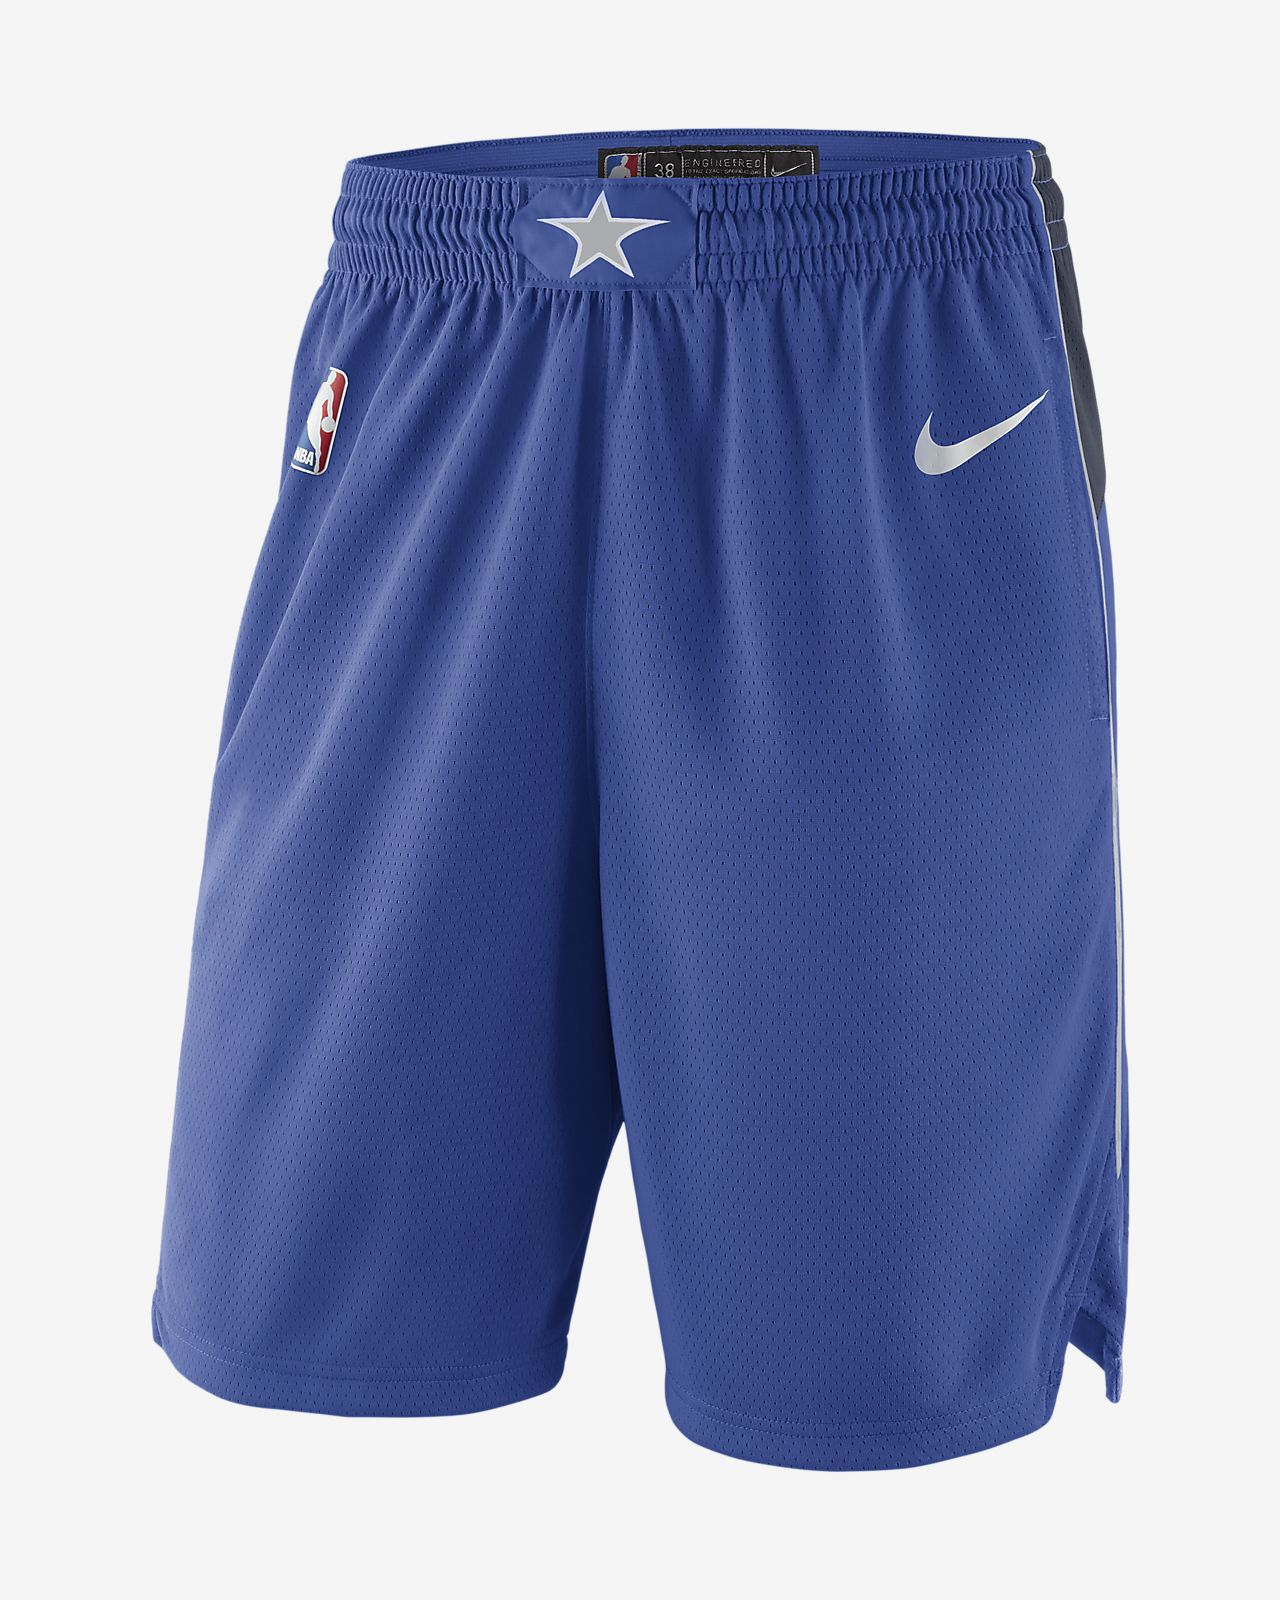 Dallas Mavericks Icon Edition Swingman Nike NBA-herenshorts